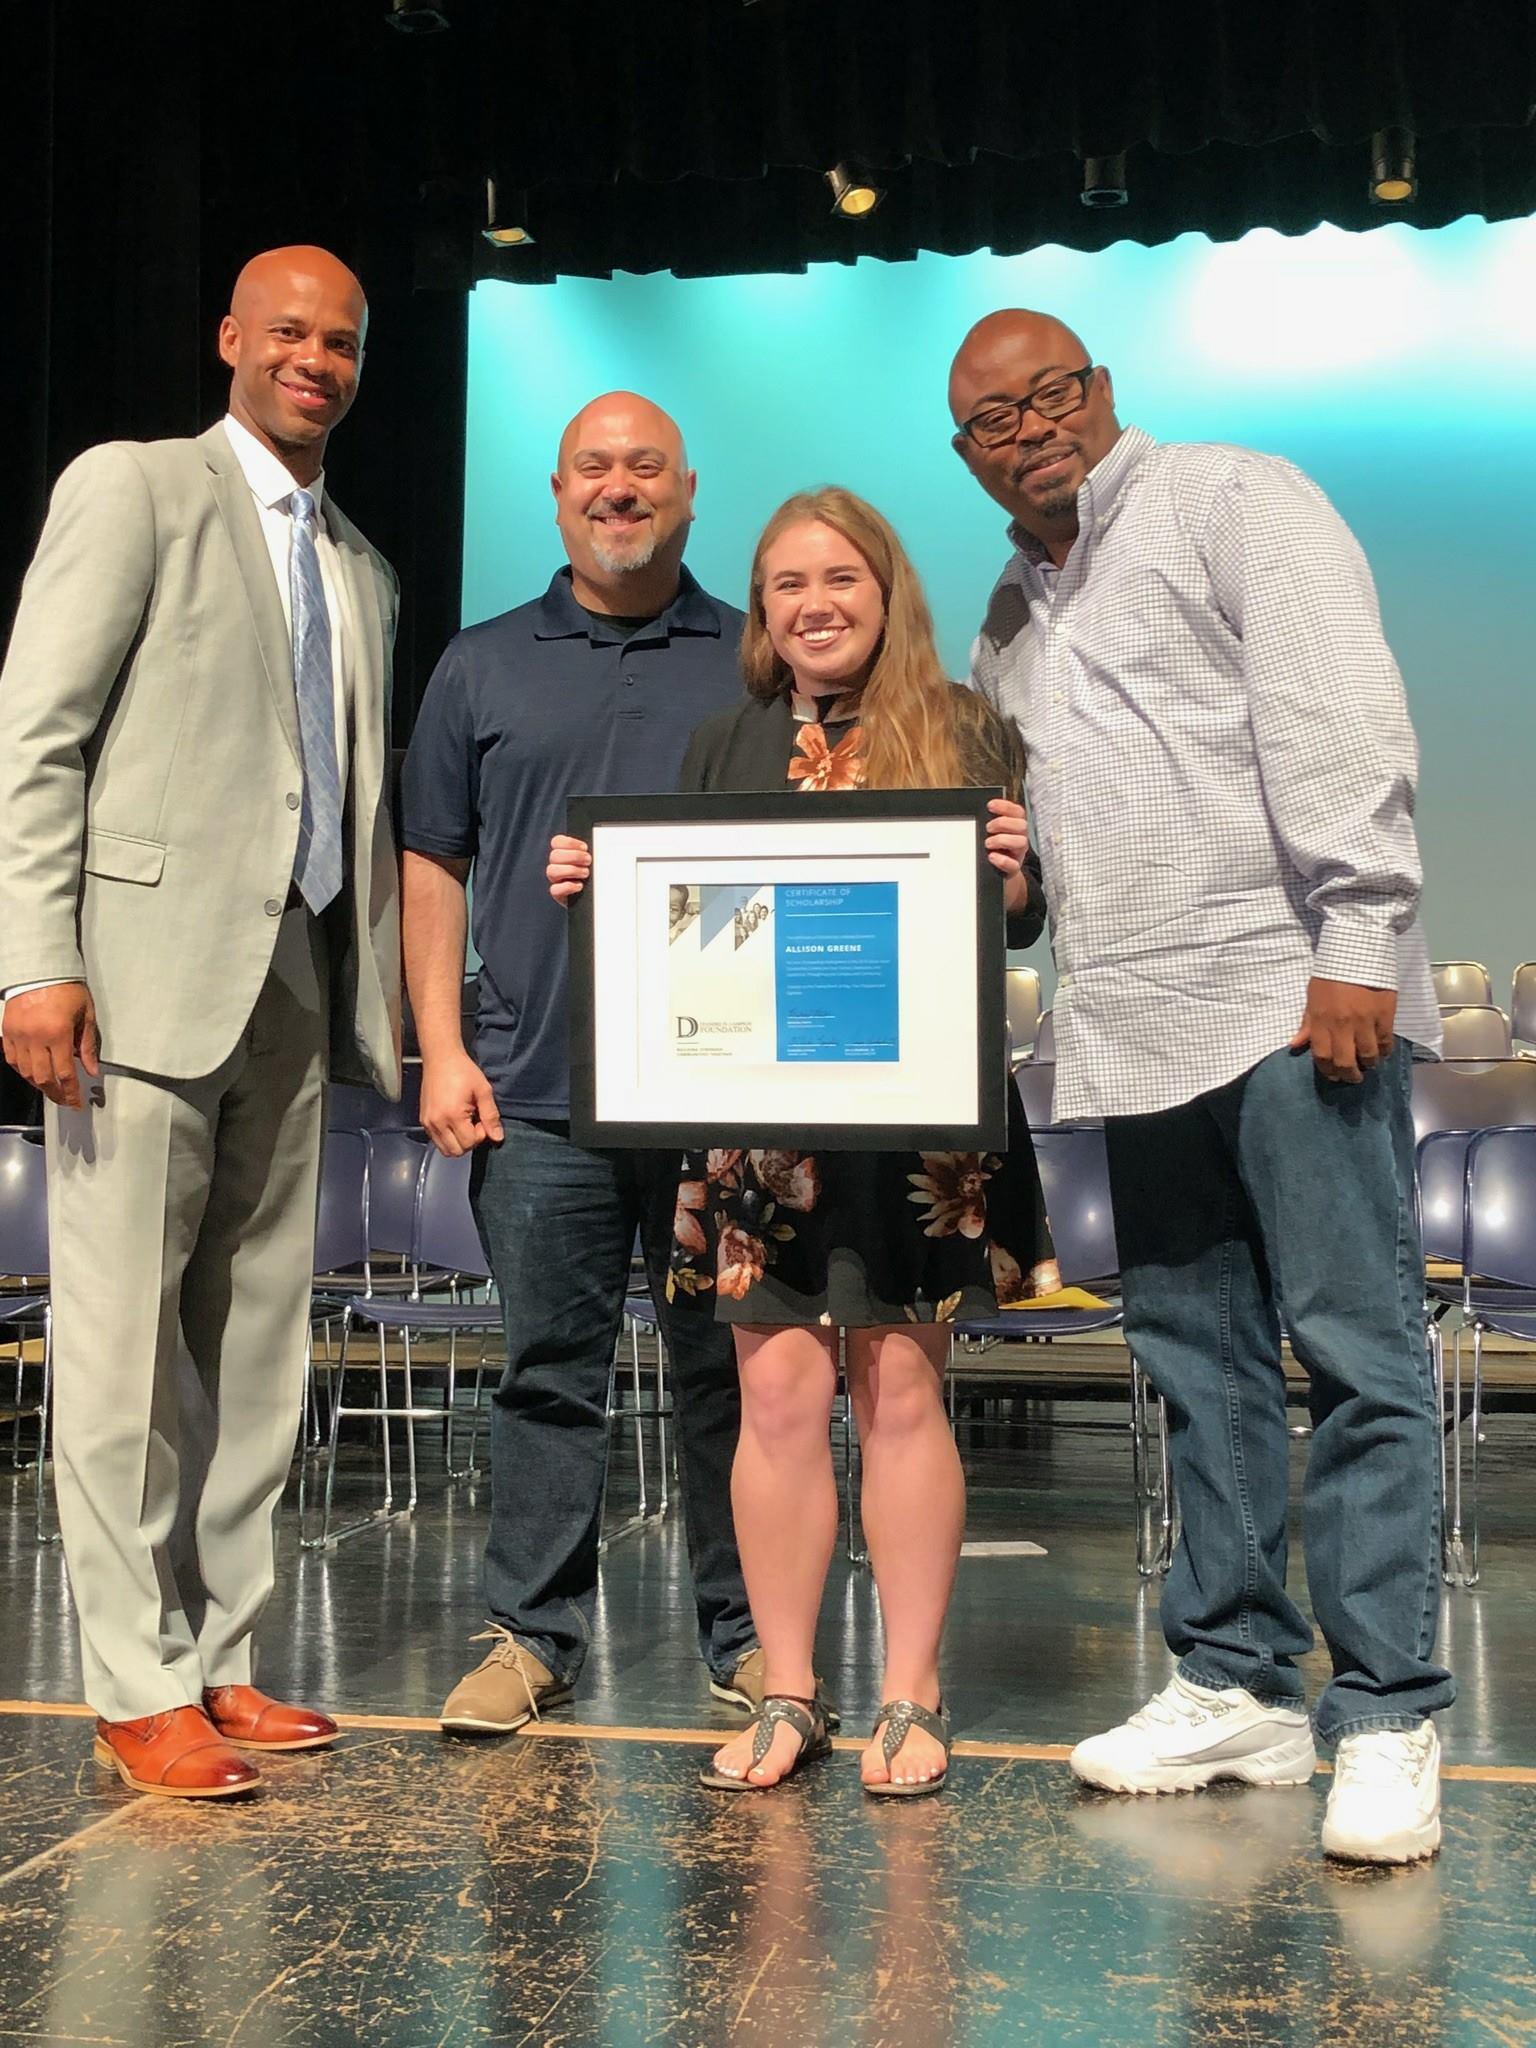 2018 scholar, Alison Greene, receiving Social Good Scholarship Award